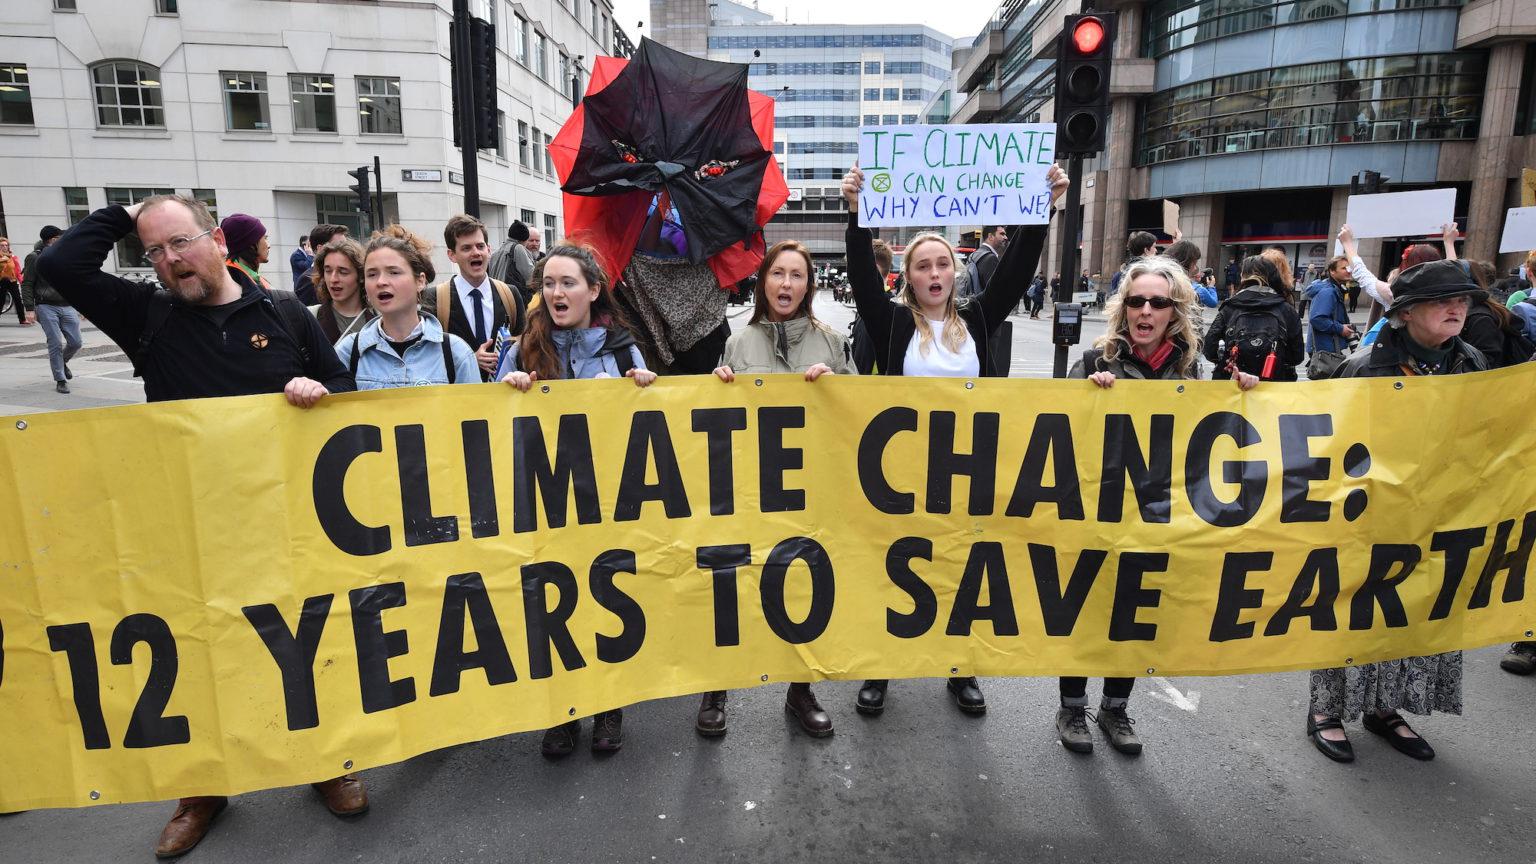 Climate alarmism is misleading the public